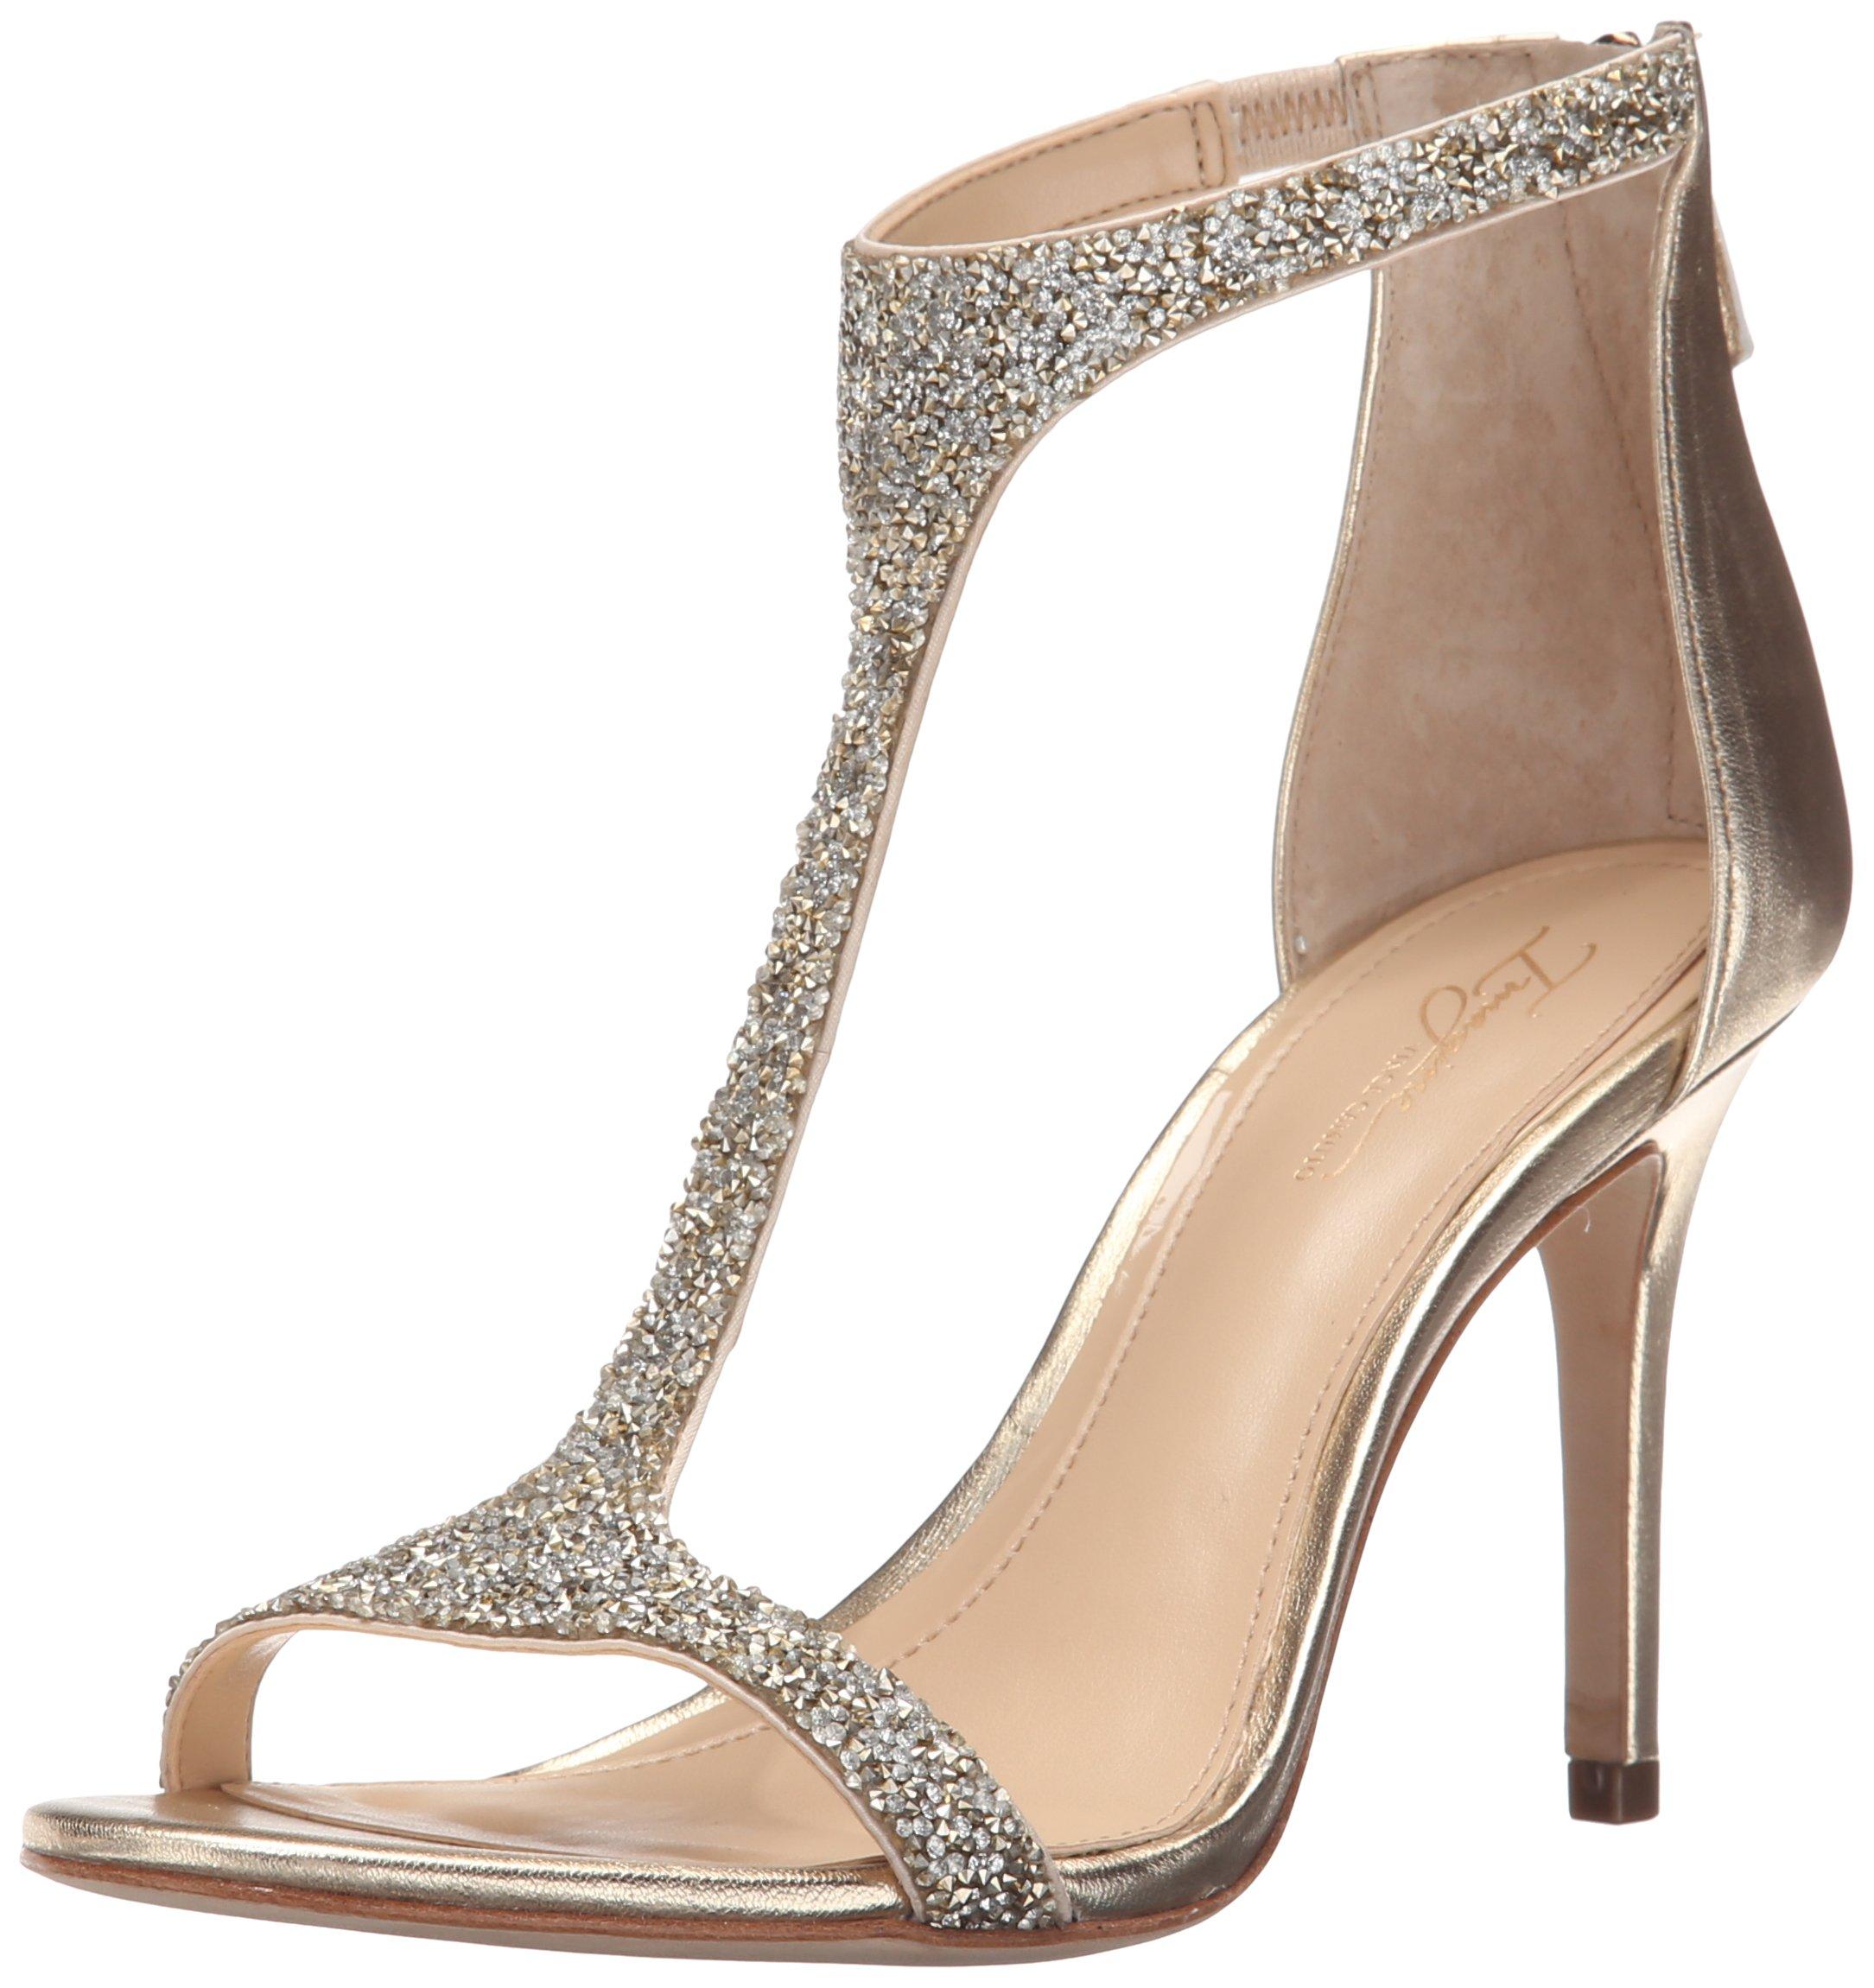 Imagine Vince Camuto Women's Im-Phoebe Dress Sandal, Crystal/Soft Gold, 9 M US by Imagine Vince Camuto